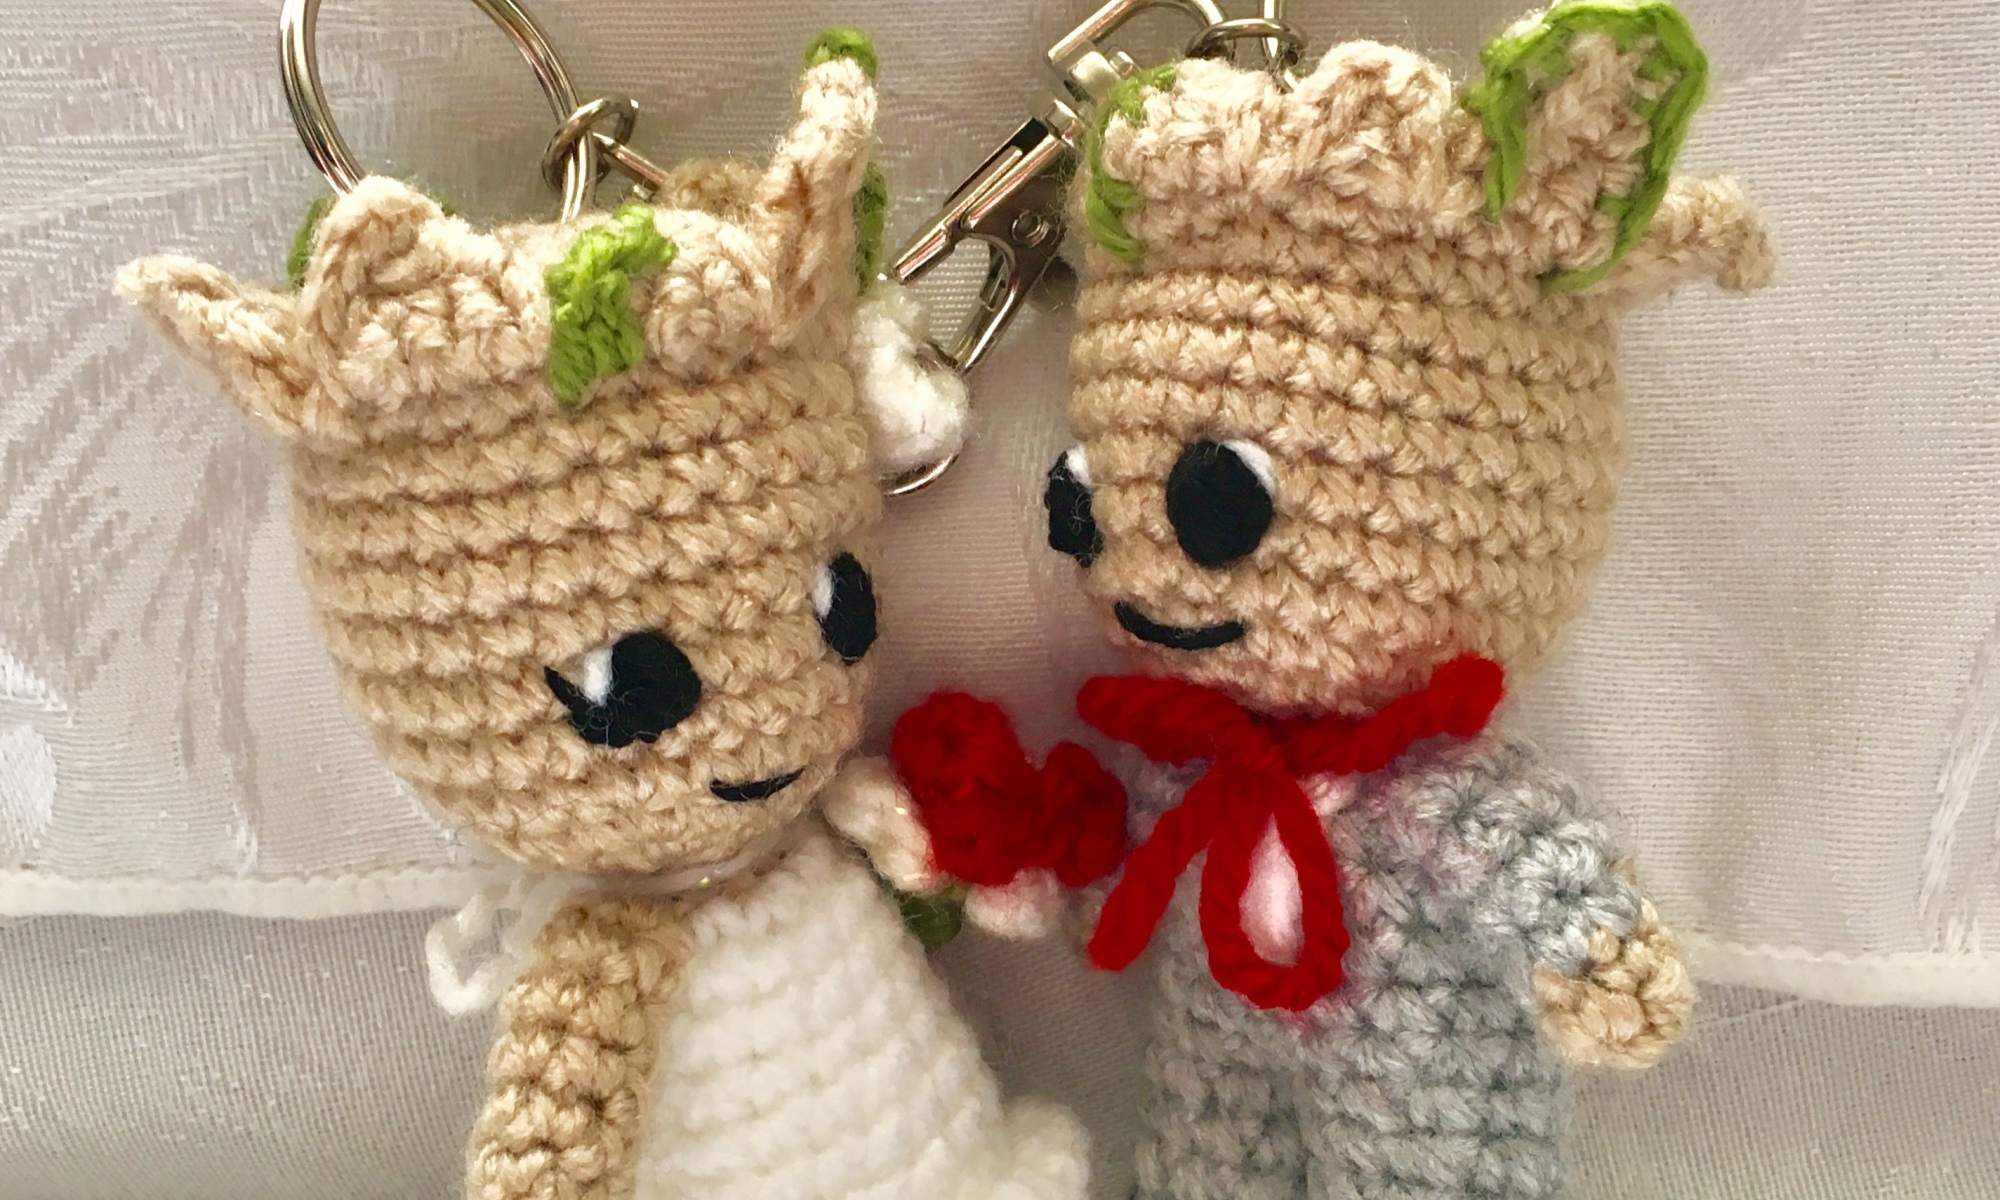 49 Best Crochet wedding images | Crochet wedding, Crochet, Crochet ... | 1200x2000